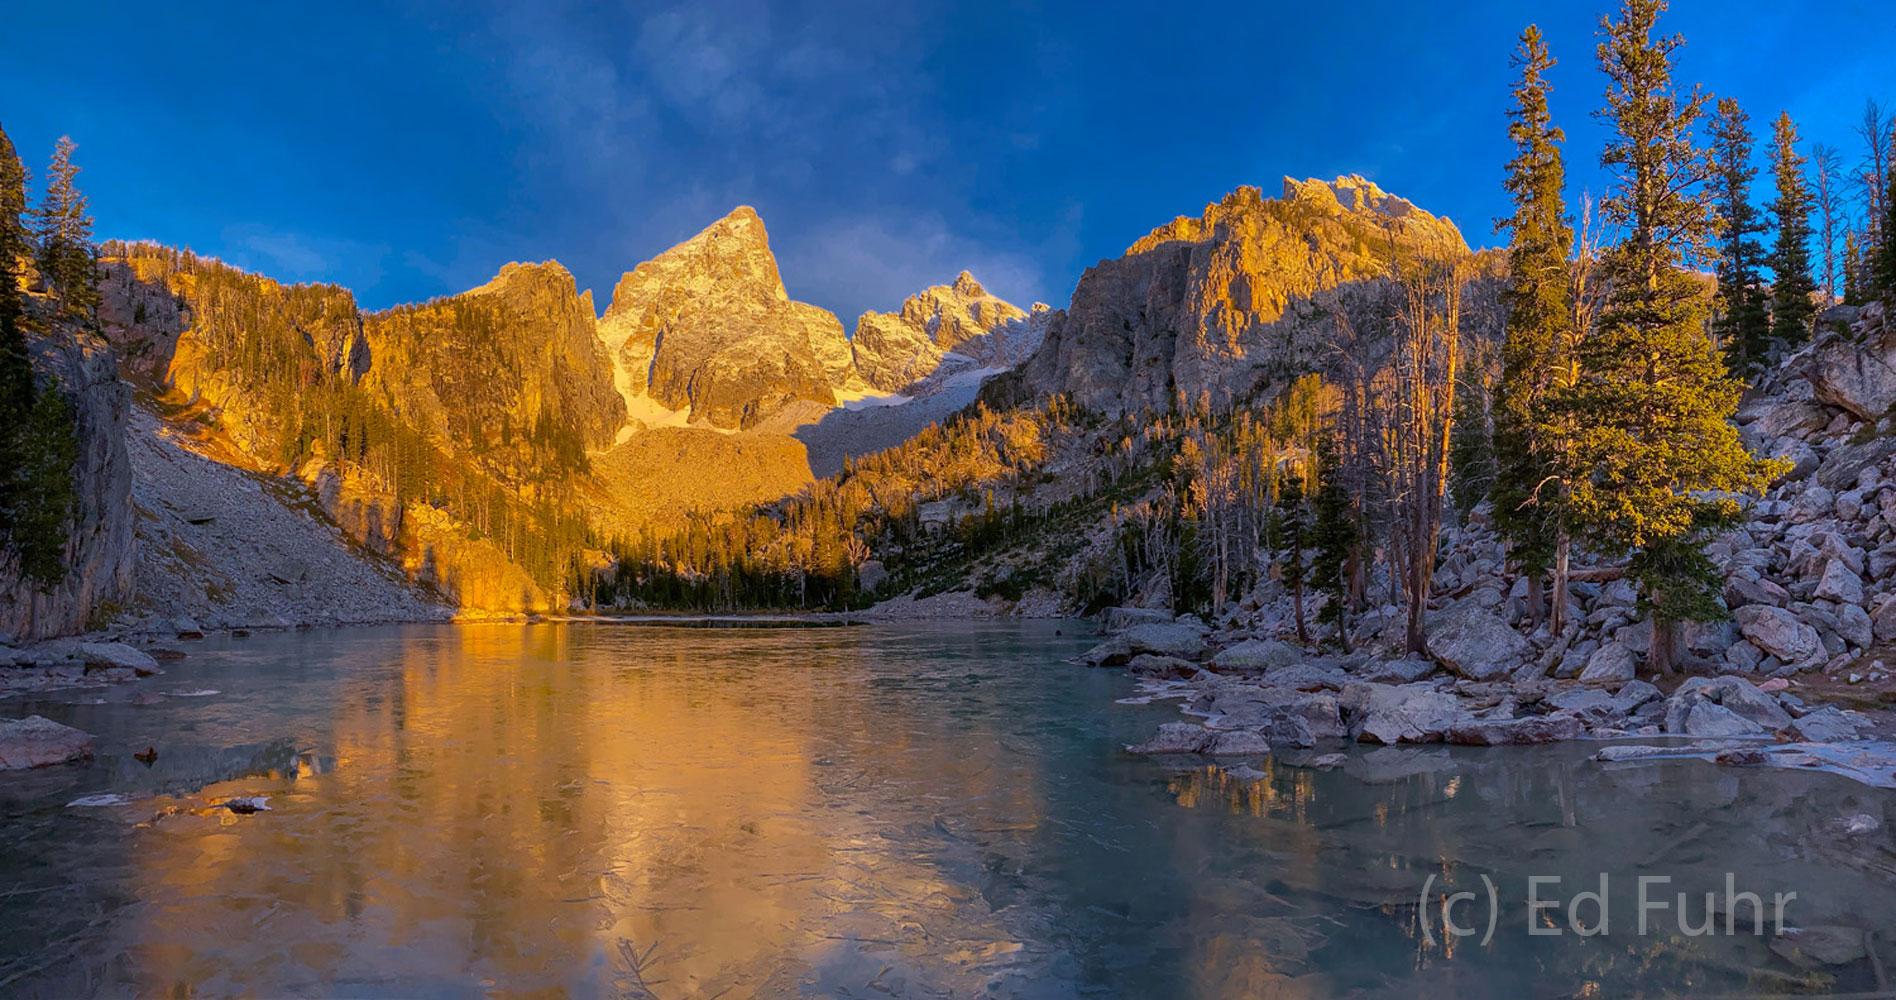 A panoramic sweep at this alpine lake at sunrise.